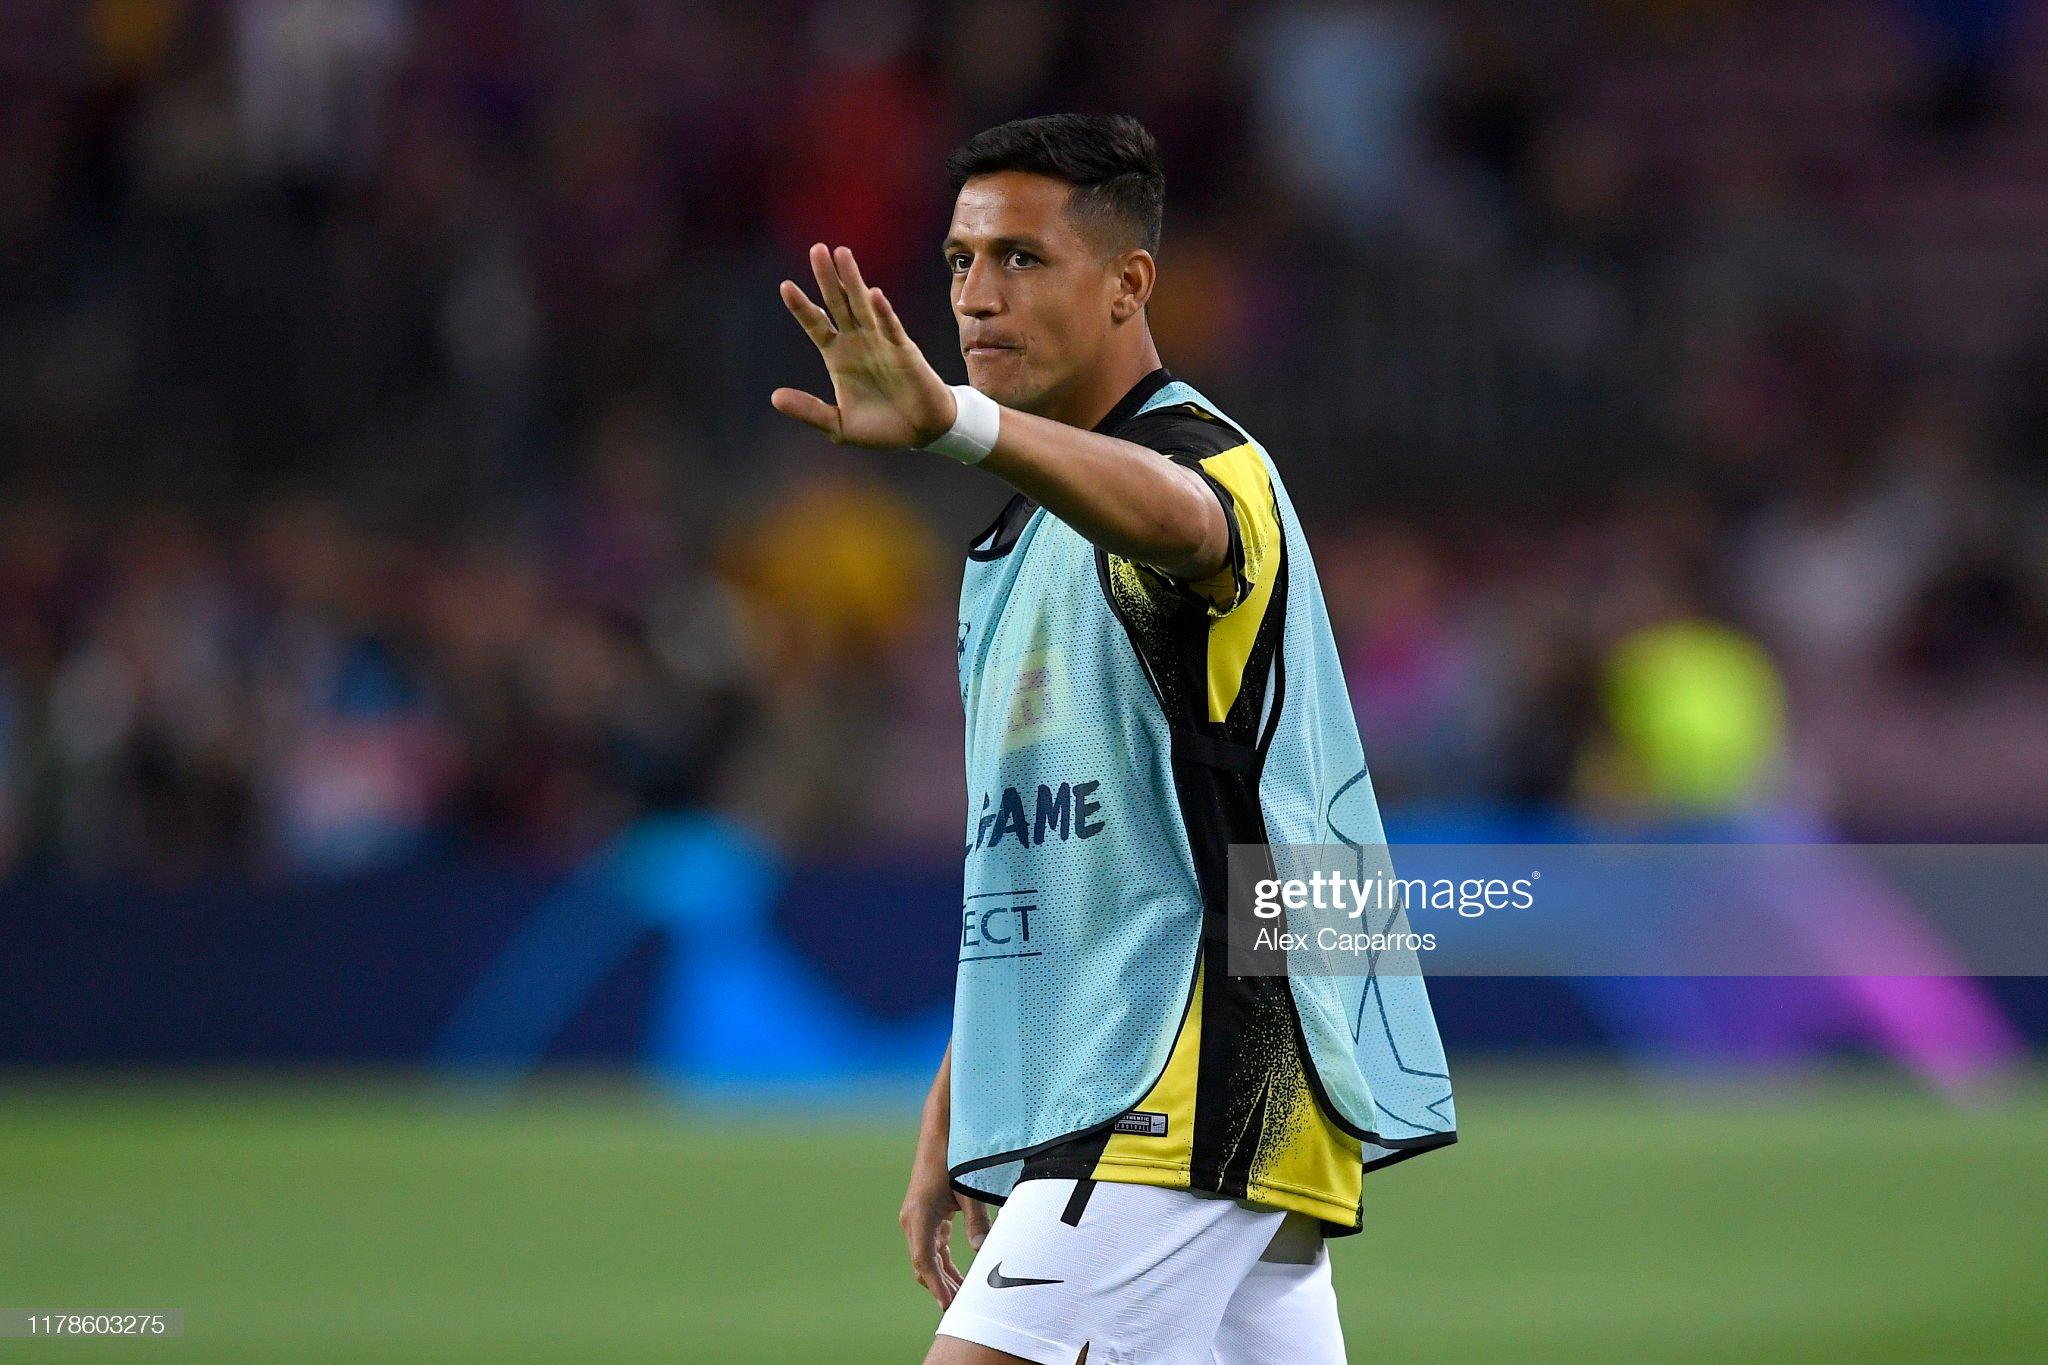 صور مباراة : برشلونة - إنتر 2-1 ( 02-10-2019 )  Alexis-sanchez-of-inter-milan-warms-up-prior-to-the-uefa-champions-picture-id1178603275?s=2048x2048